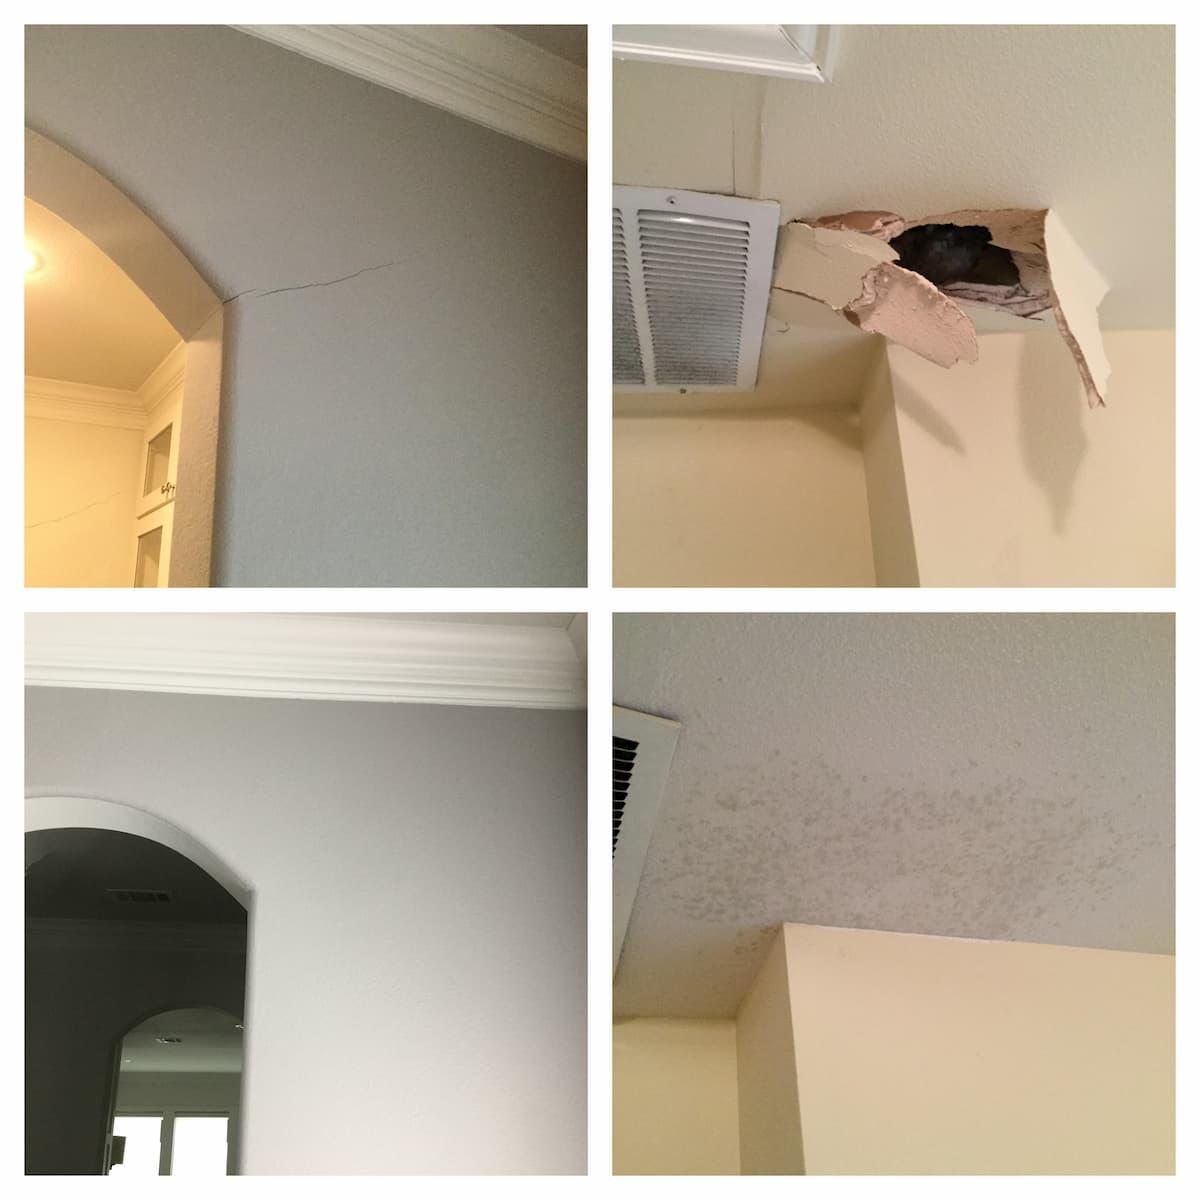 Addison Handyman drywall repair